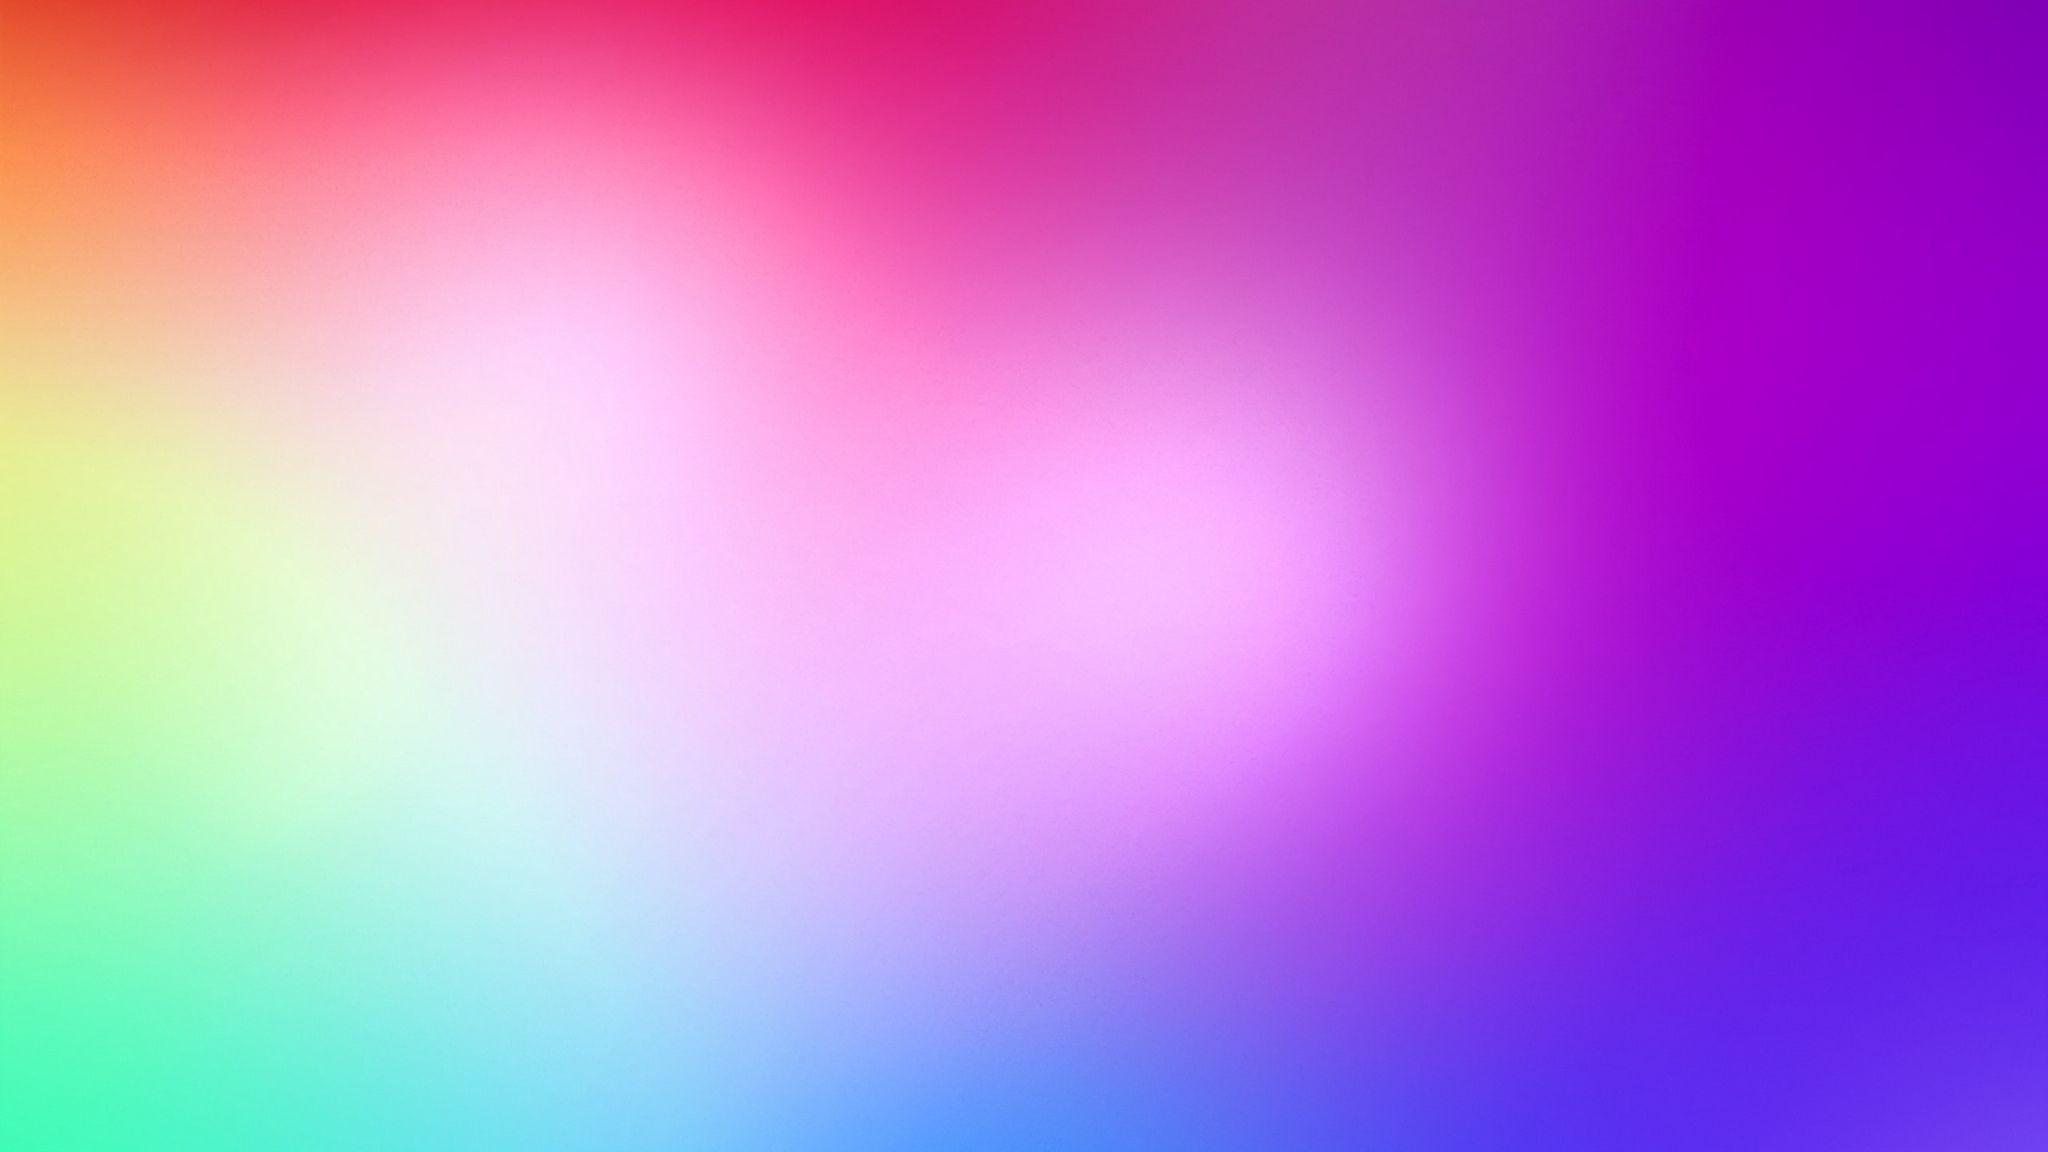 Banner 2048x1152 background image